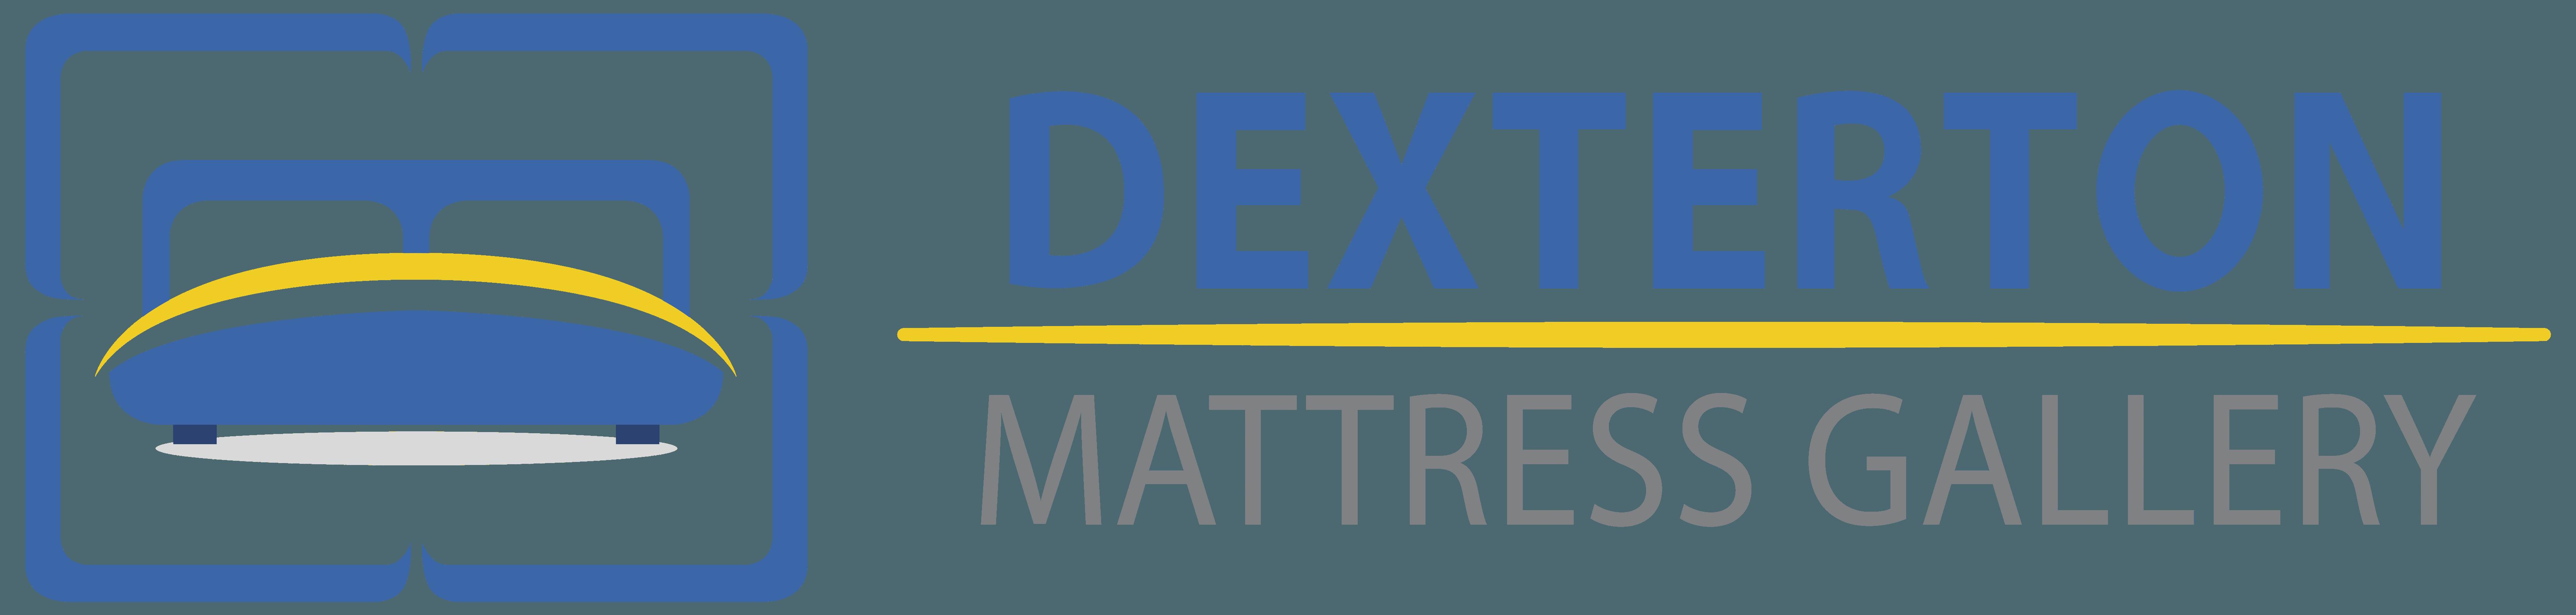 Mattress Reviews L What S The Best Mattress To Buy L Top